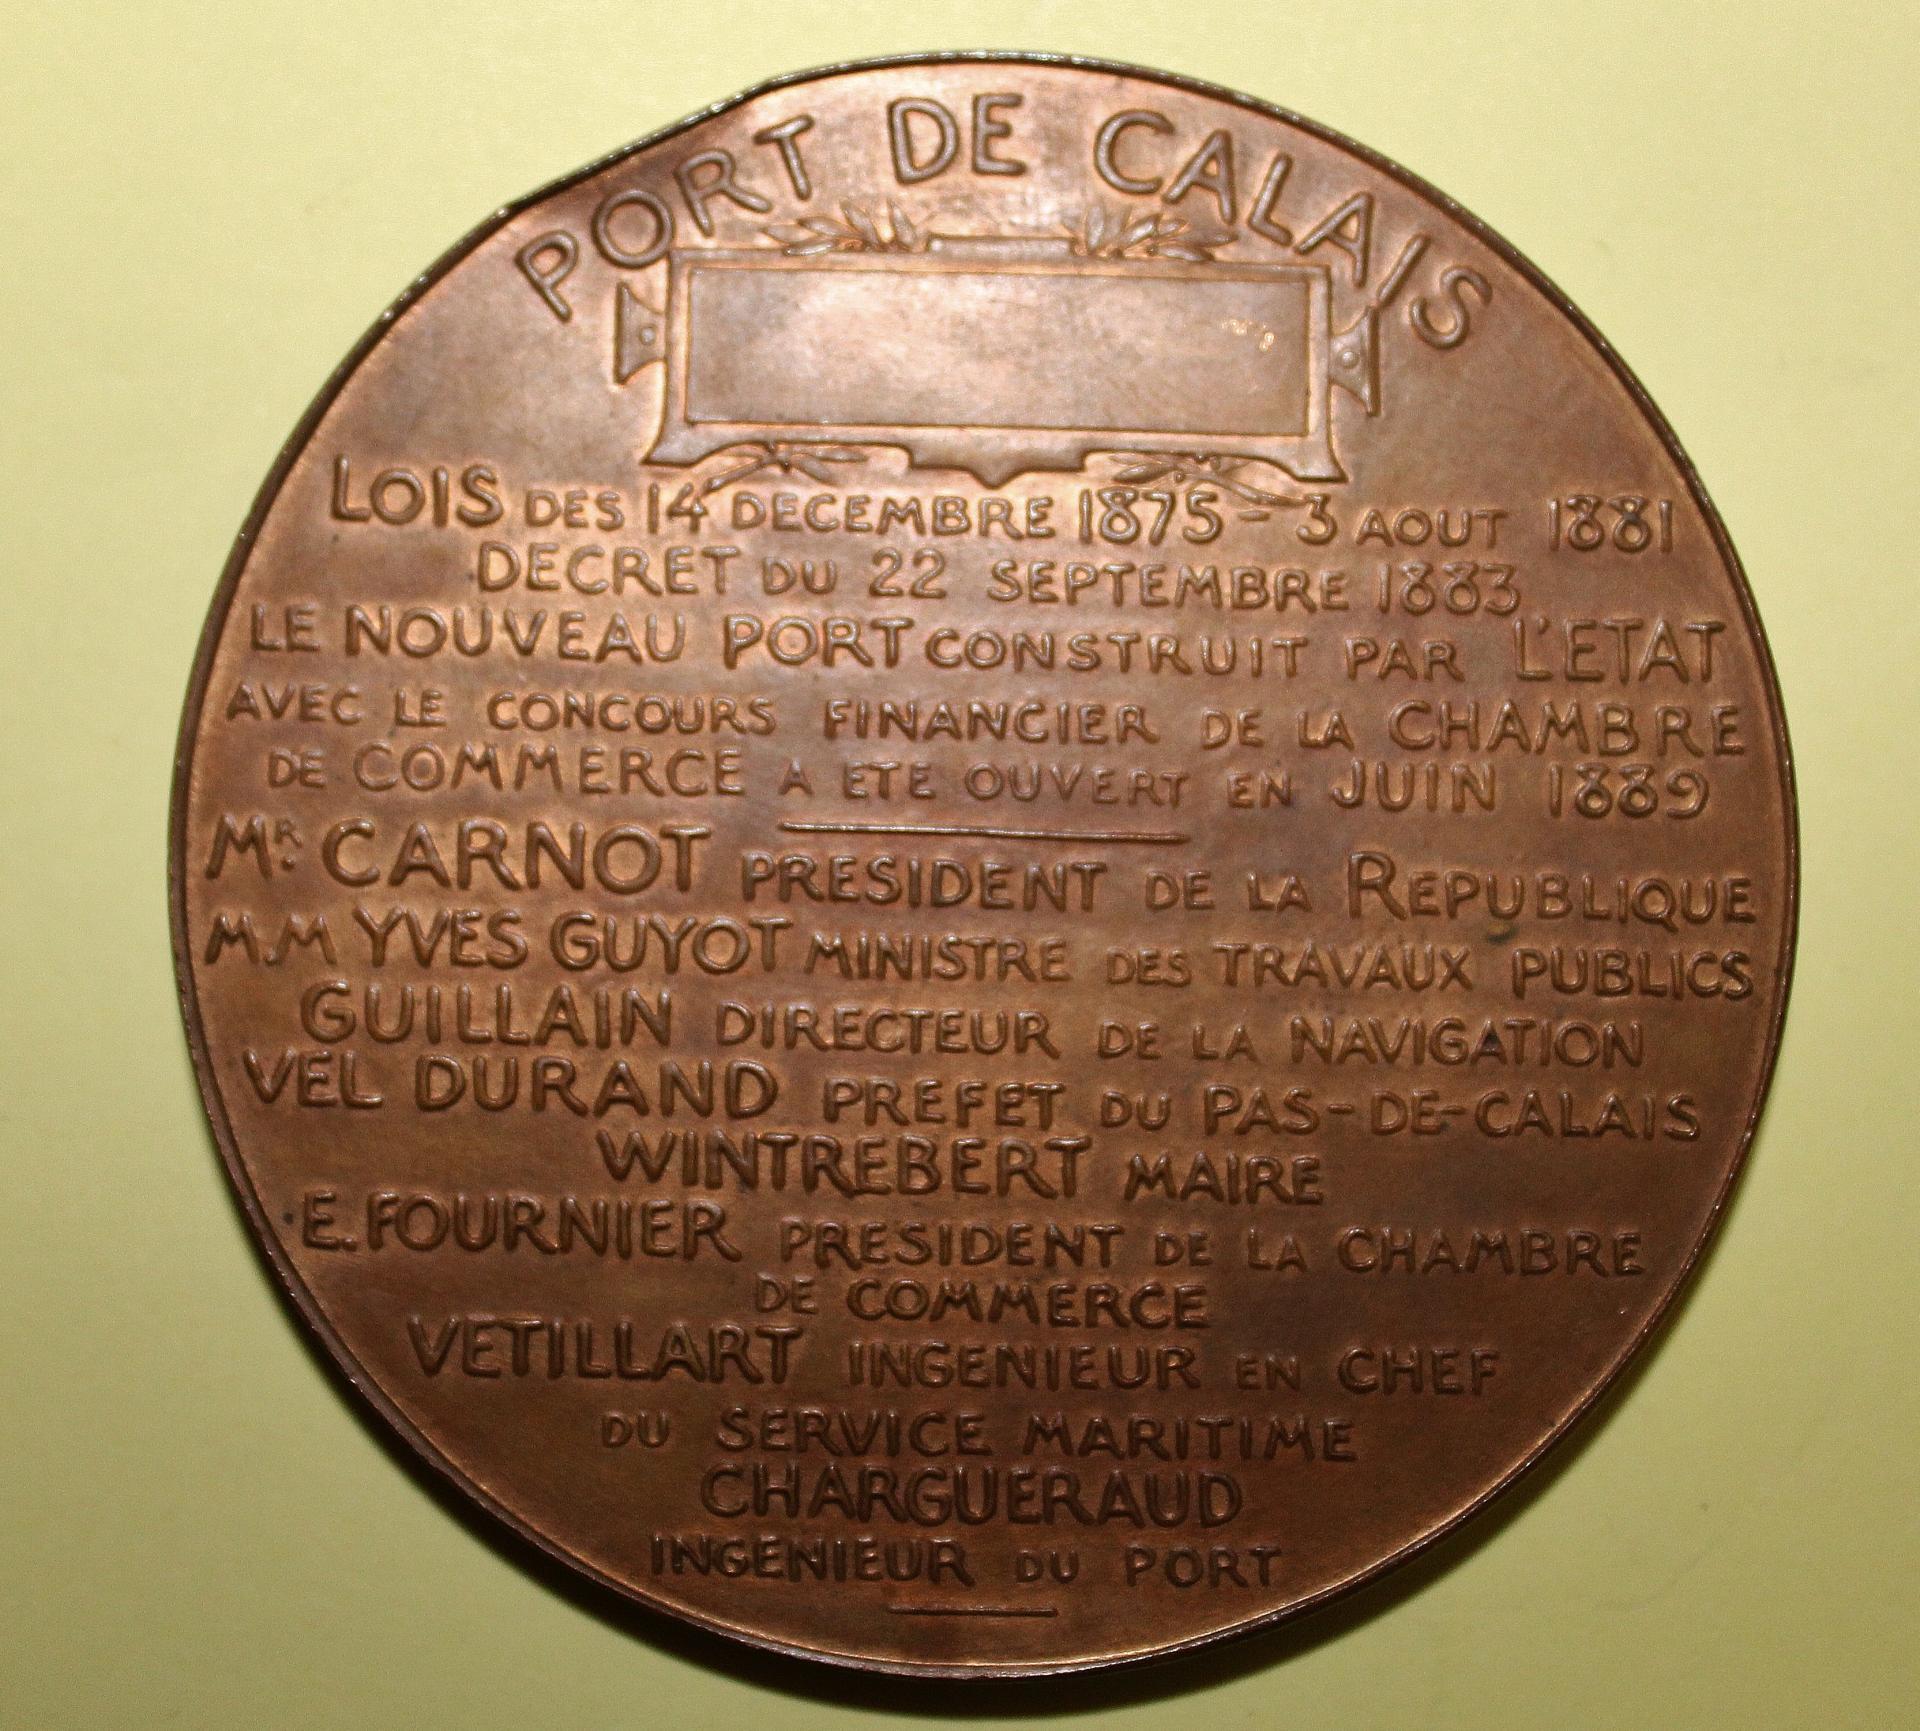 Calais inauguration du nouveau port verso